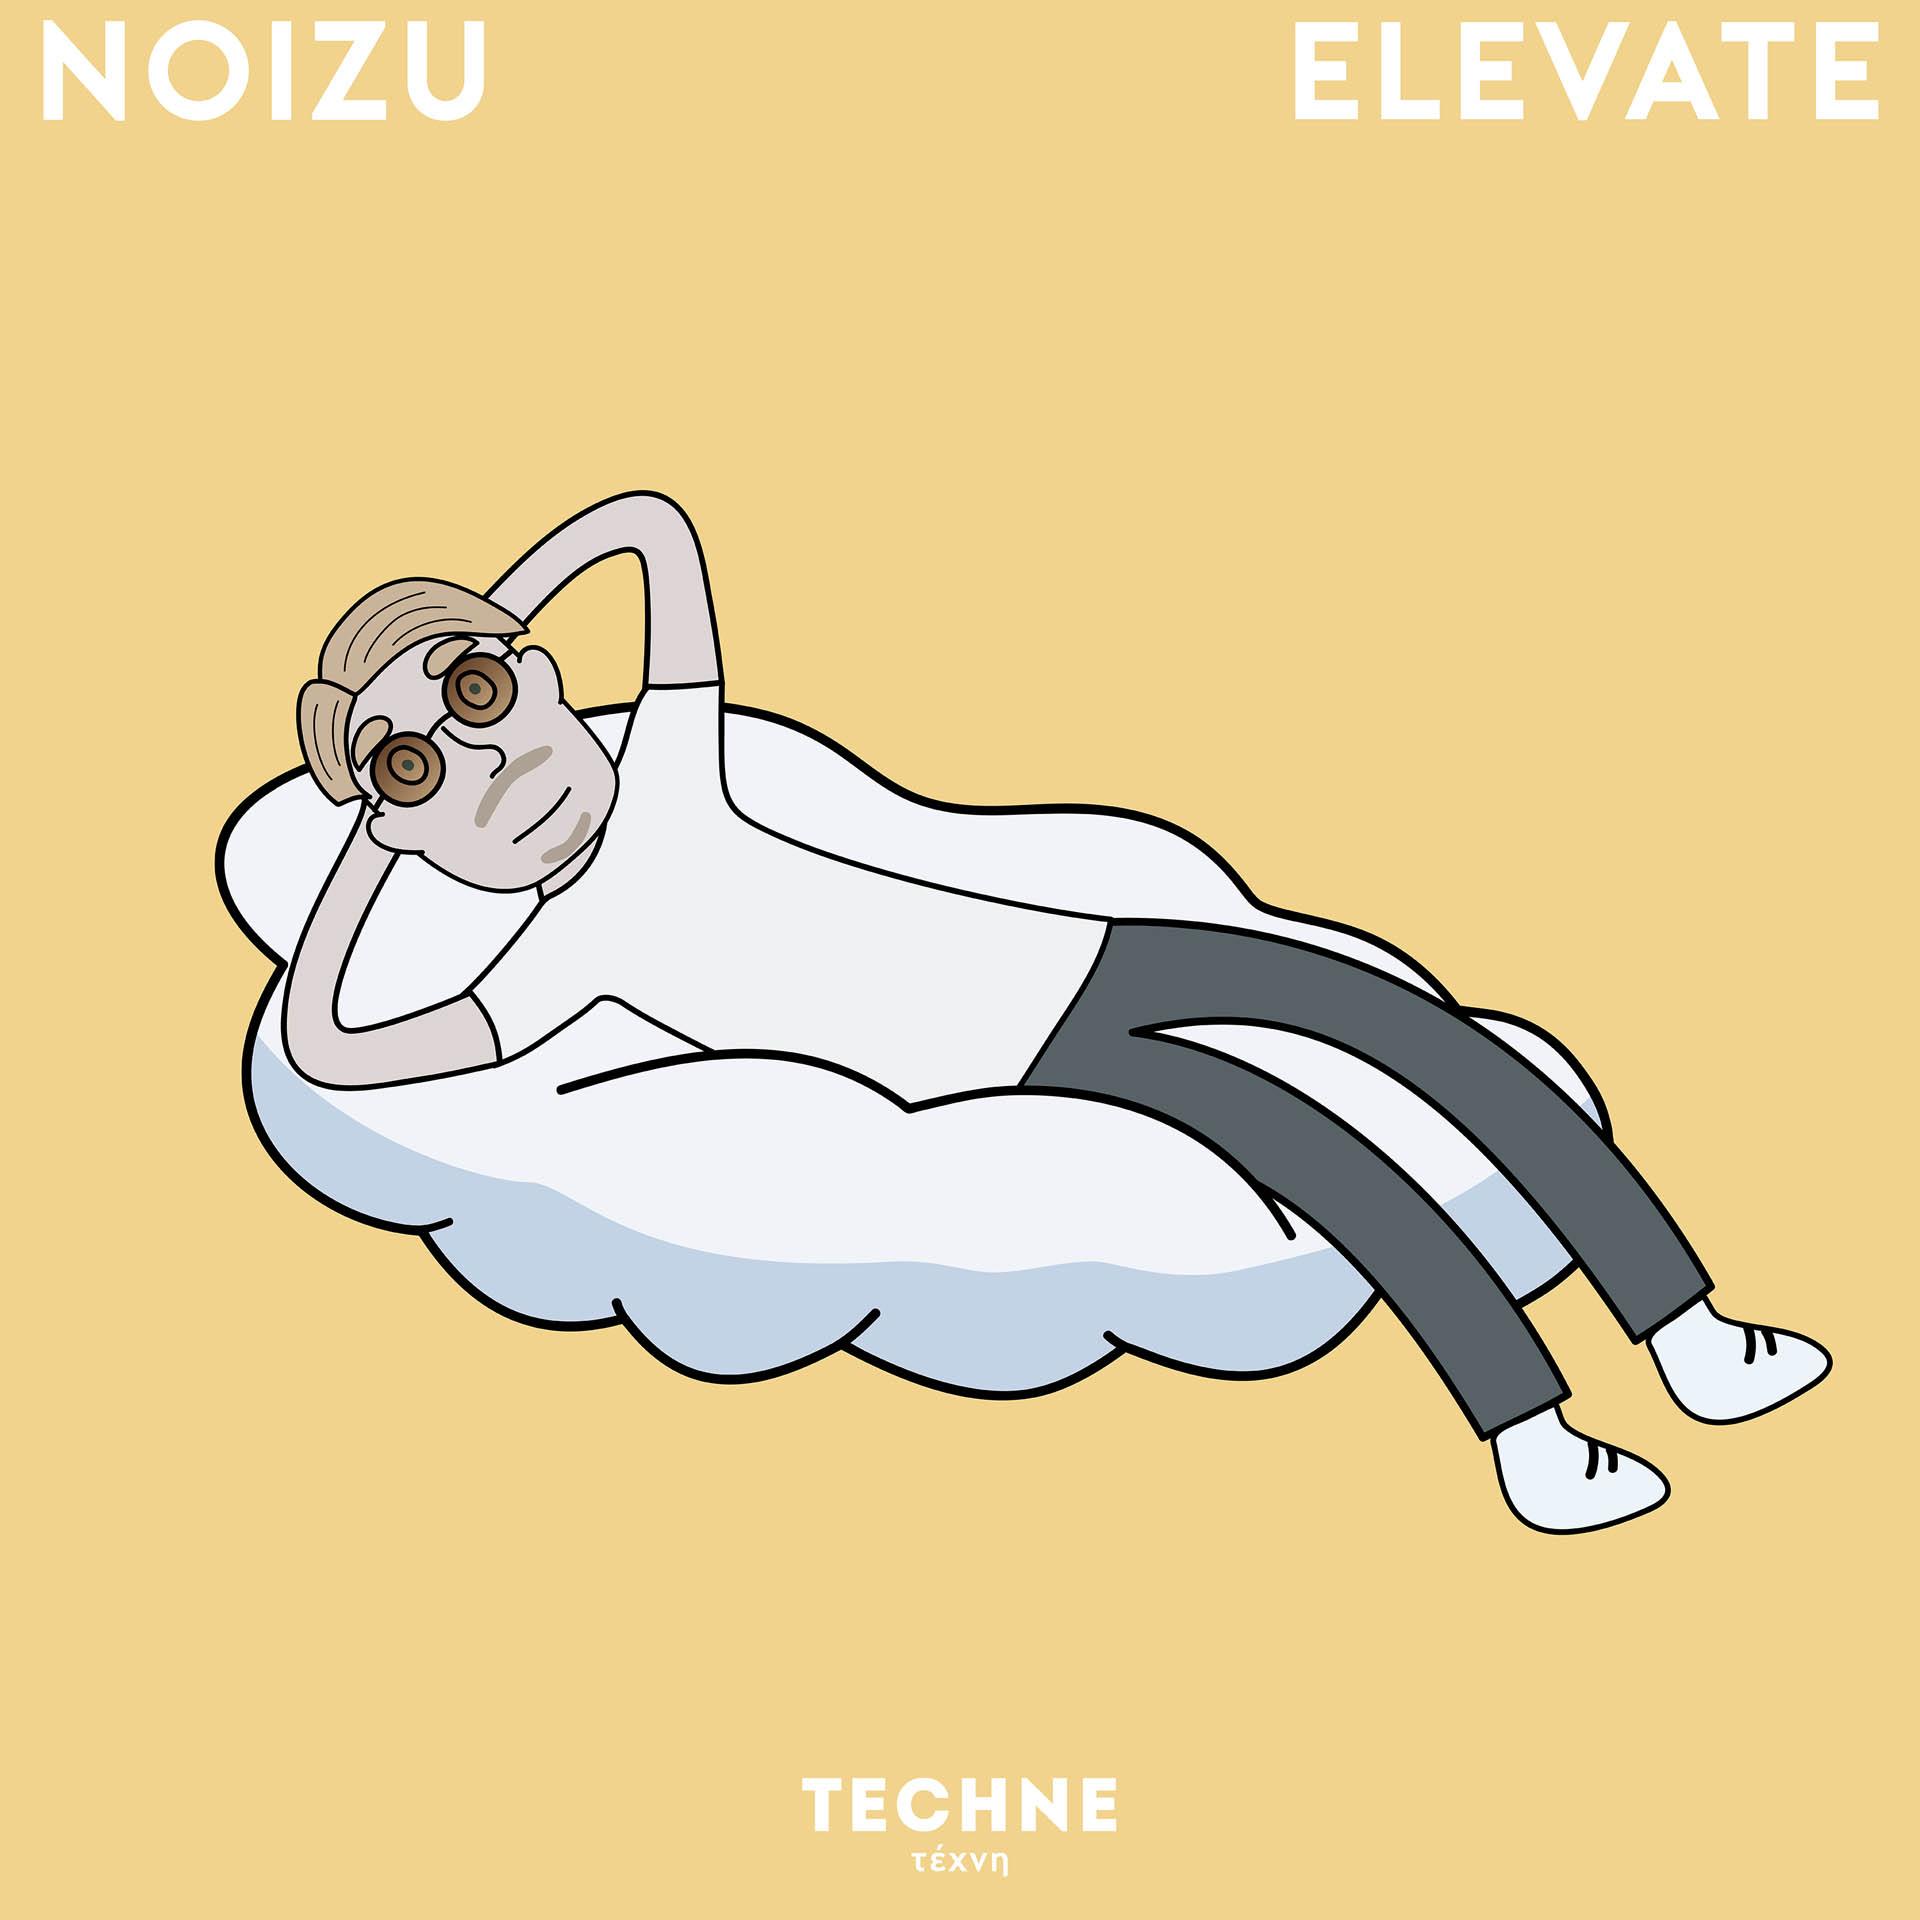 Elevate - Noizu